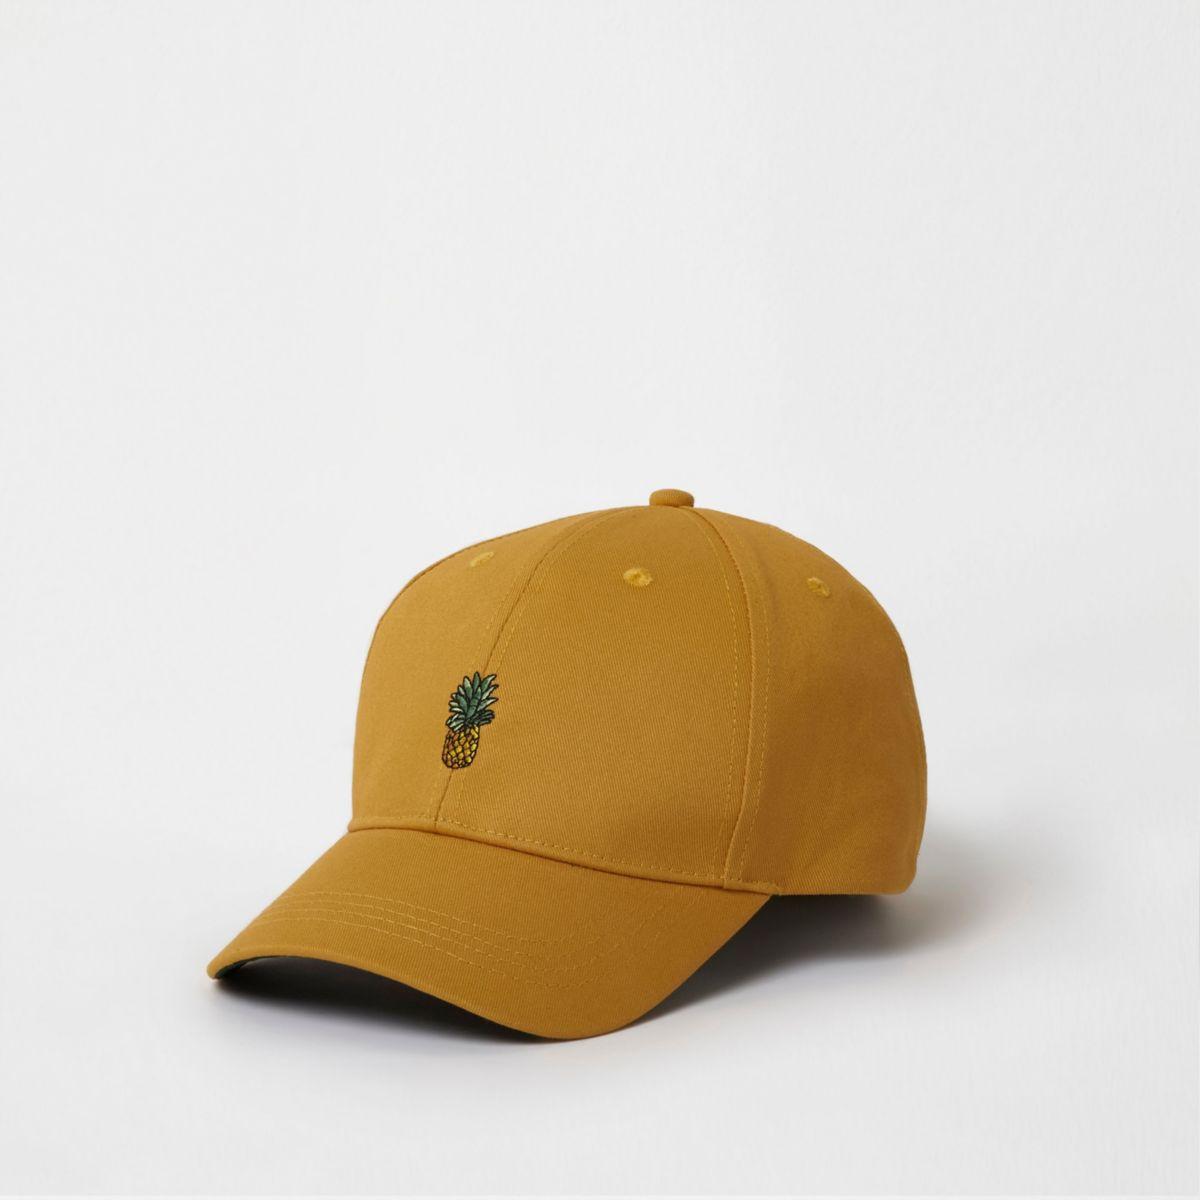 Yellow pineapple baseball cap